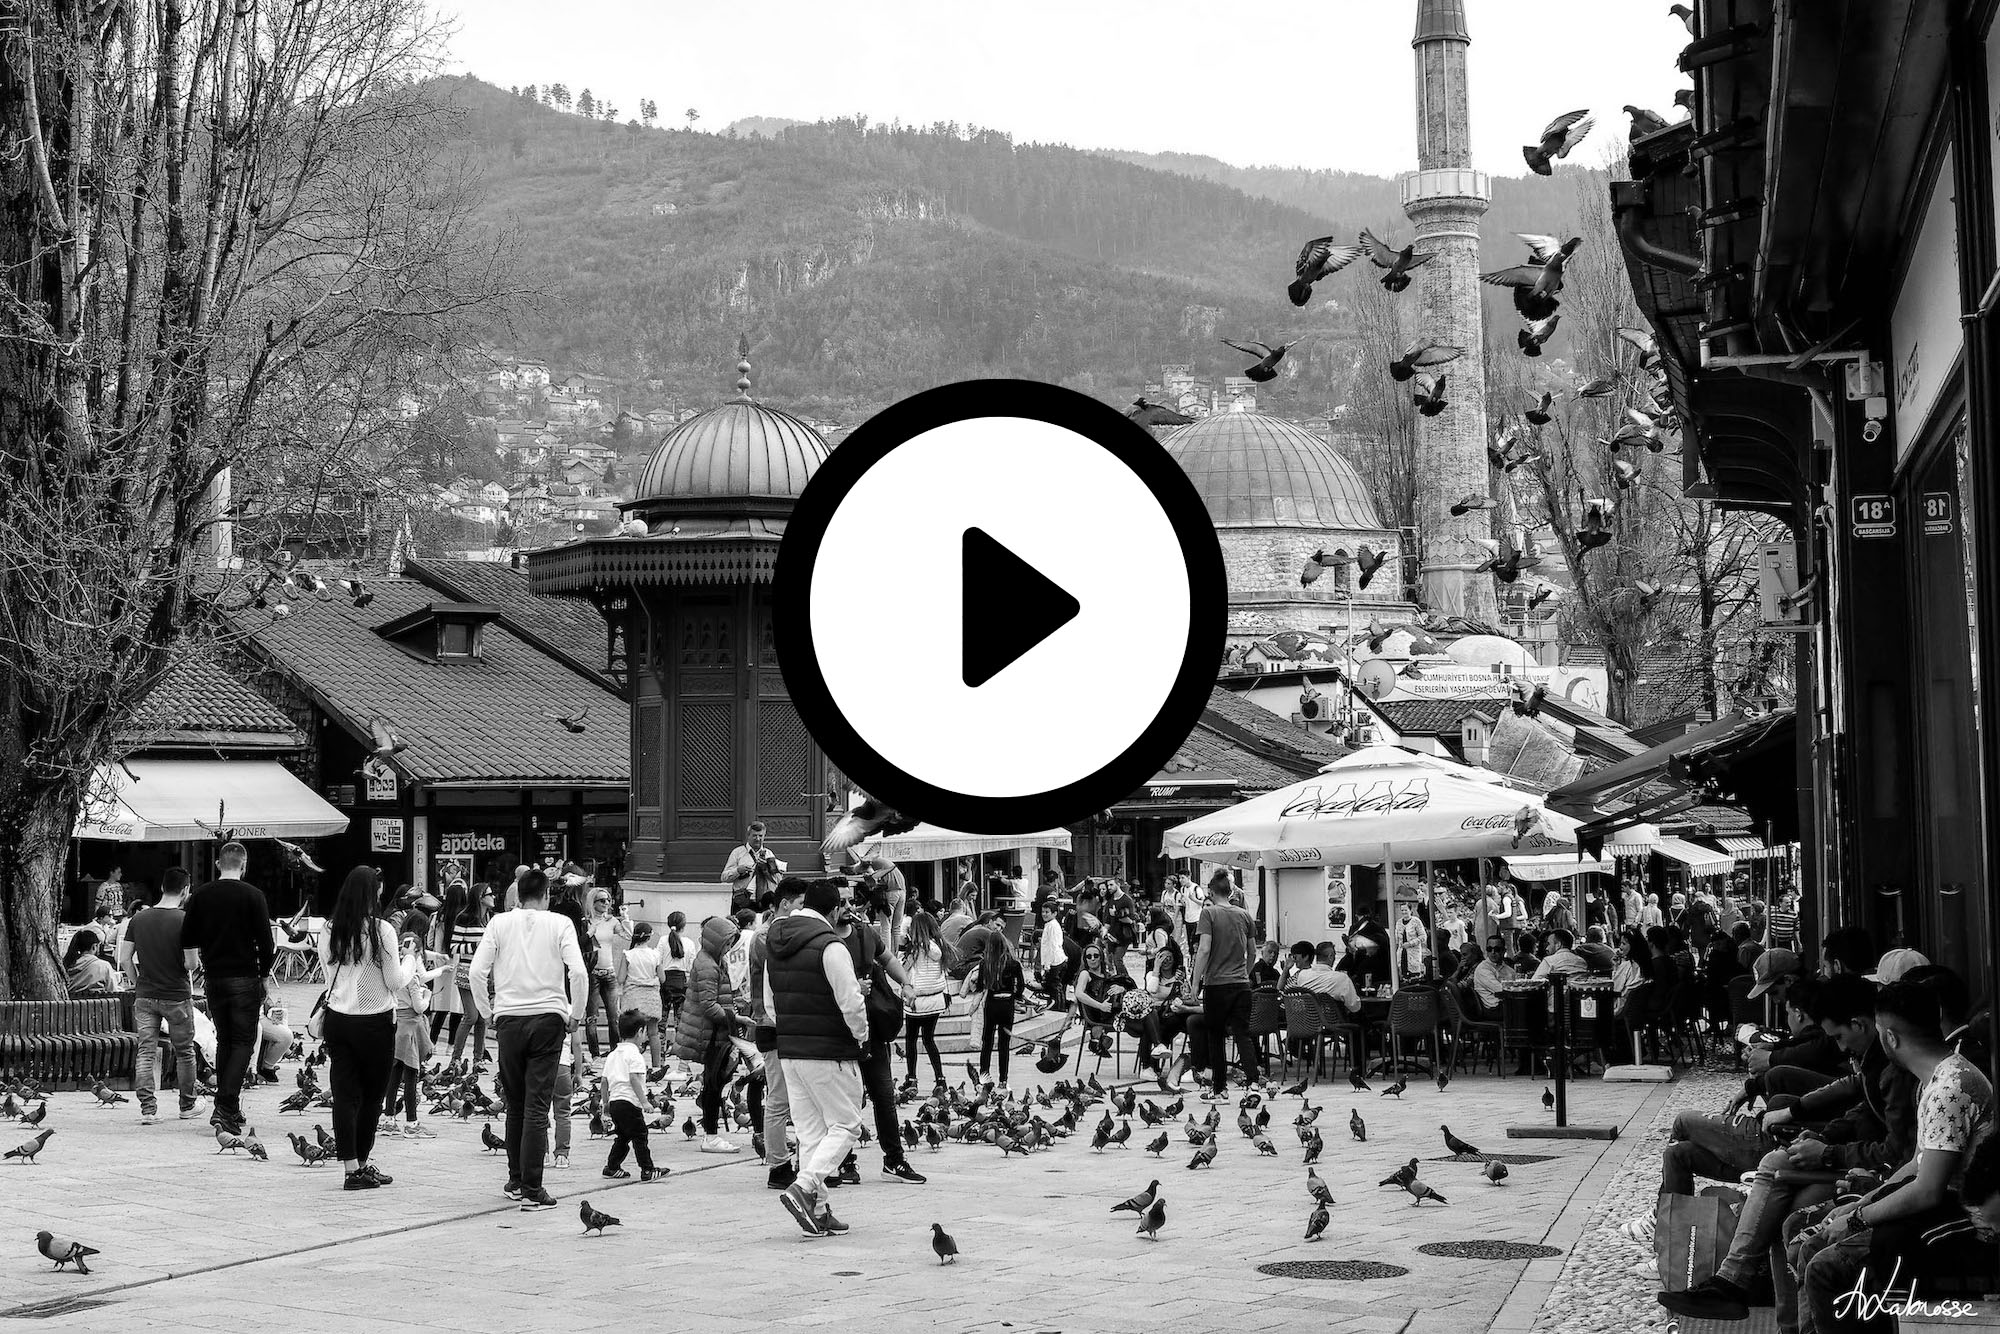 Sarajevo, premières émotions